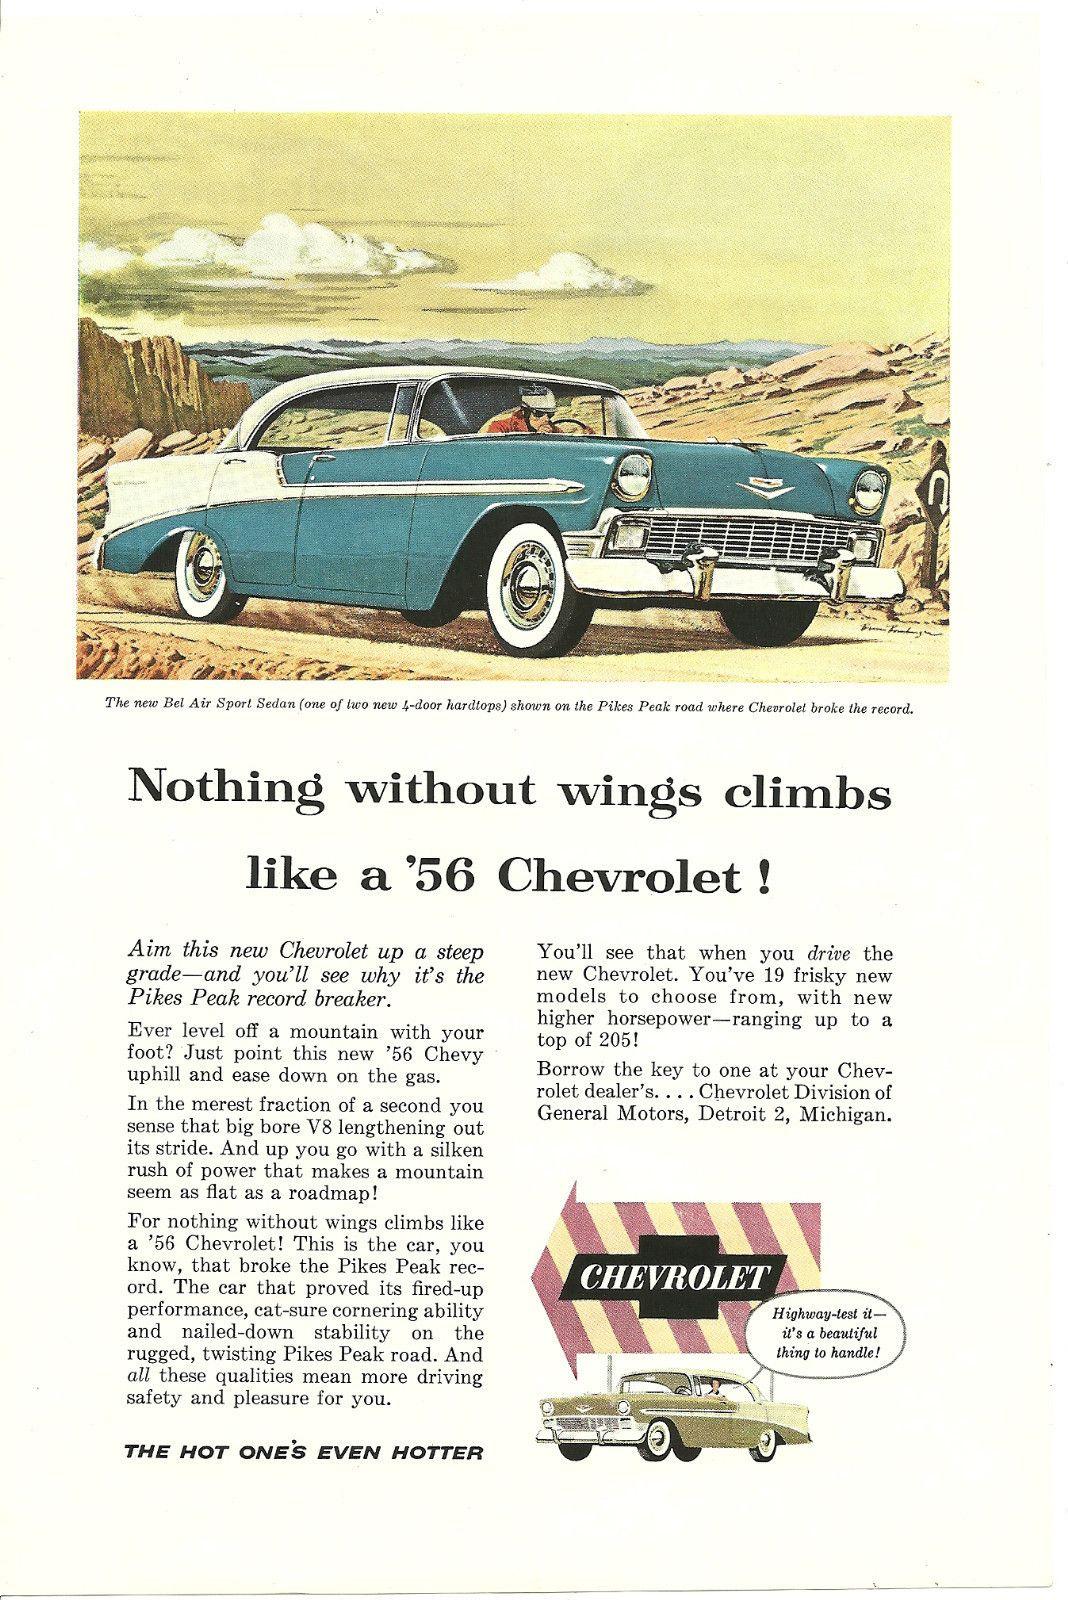 Chevrolet 1955 Bel Air ad for Pike's Peak Road Challenge